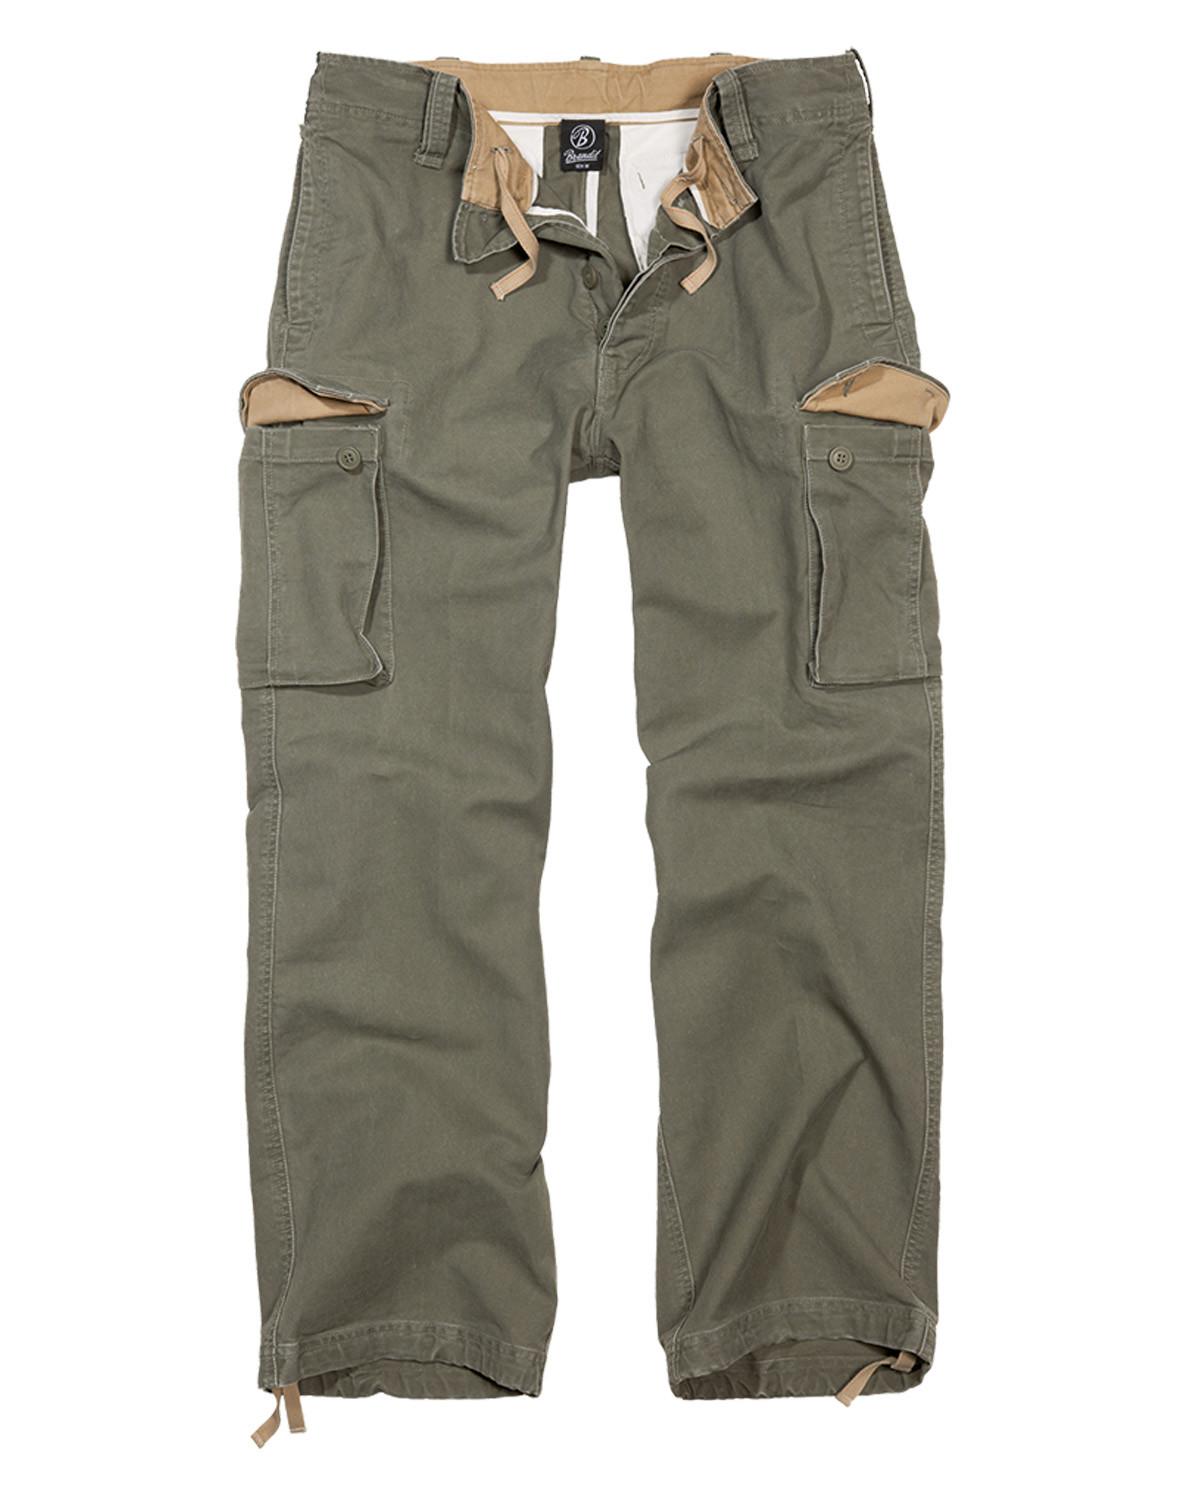 Køb Brandit Heavy Weight Bukser | Fri Fragt over 600 |ARMY STAR